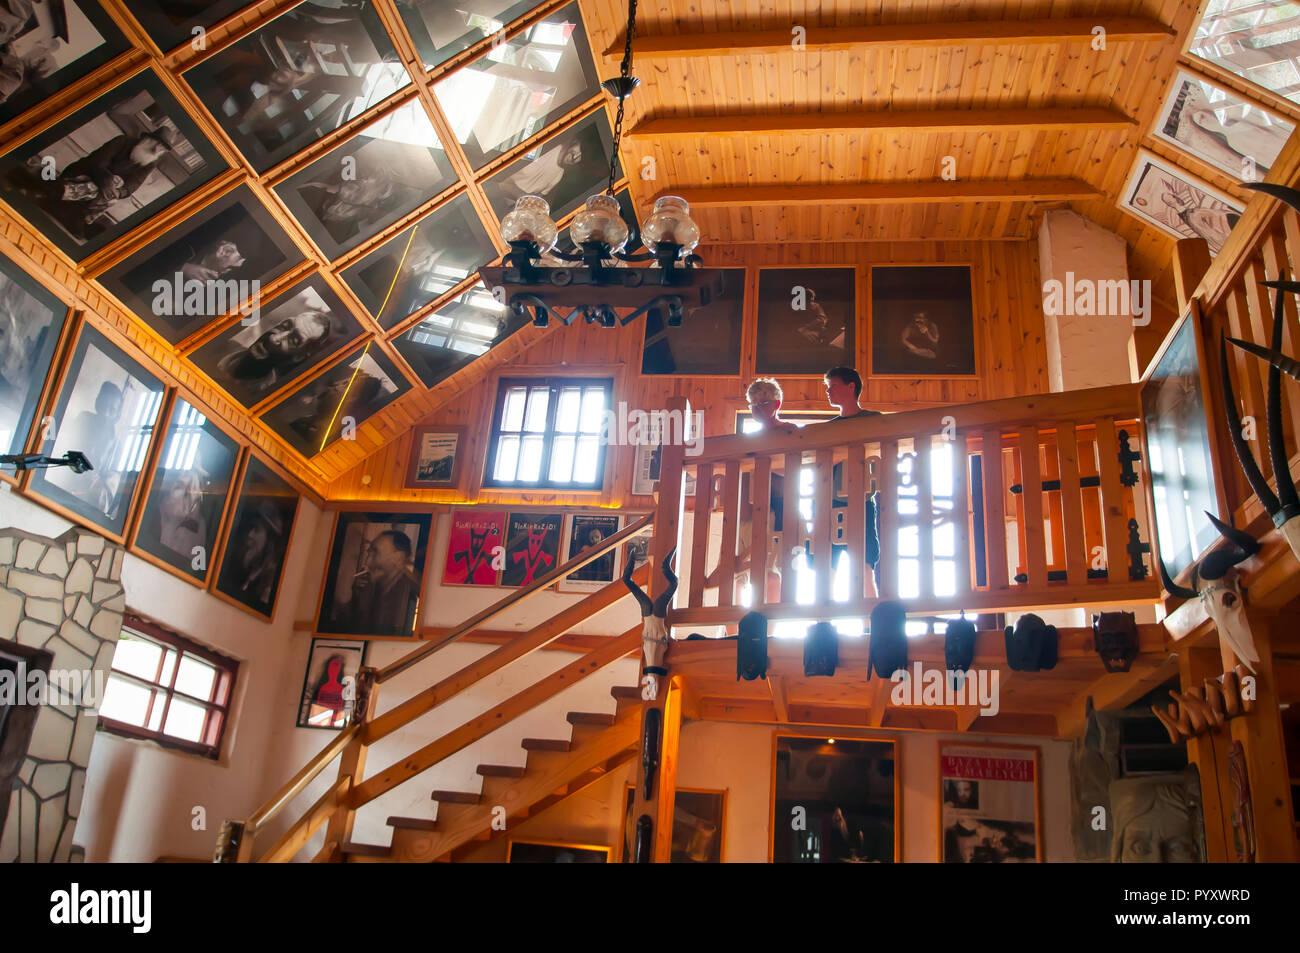 Cisna, Poland, July 2018  Famous Siekierezada bar in Cisna